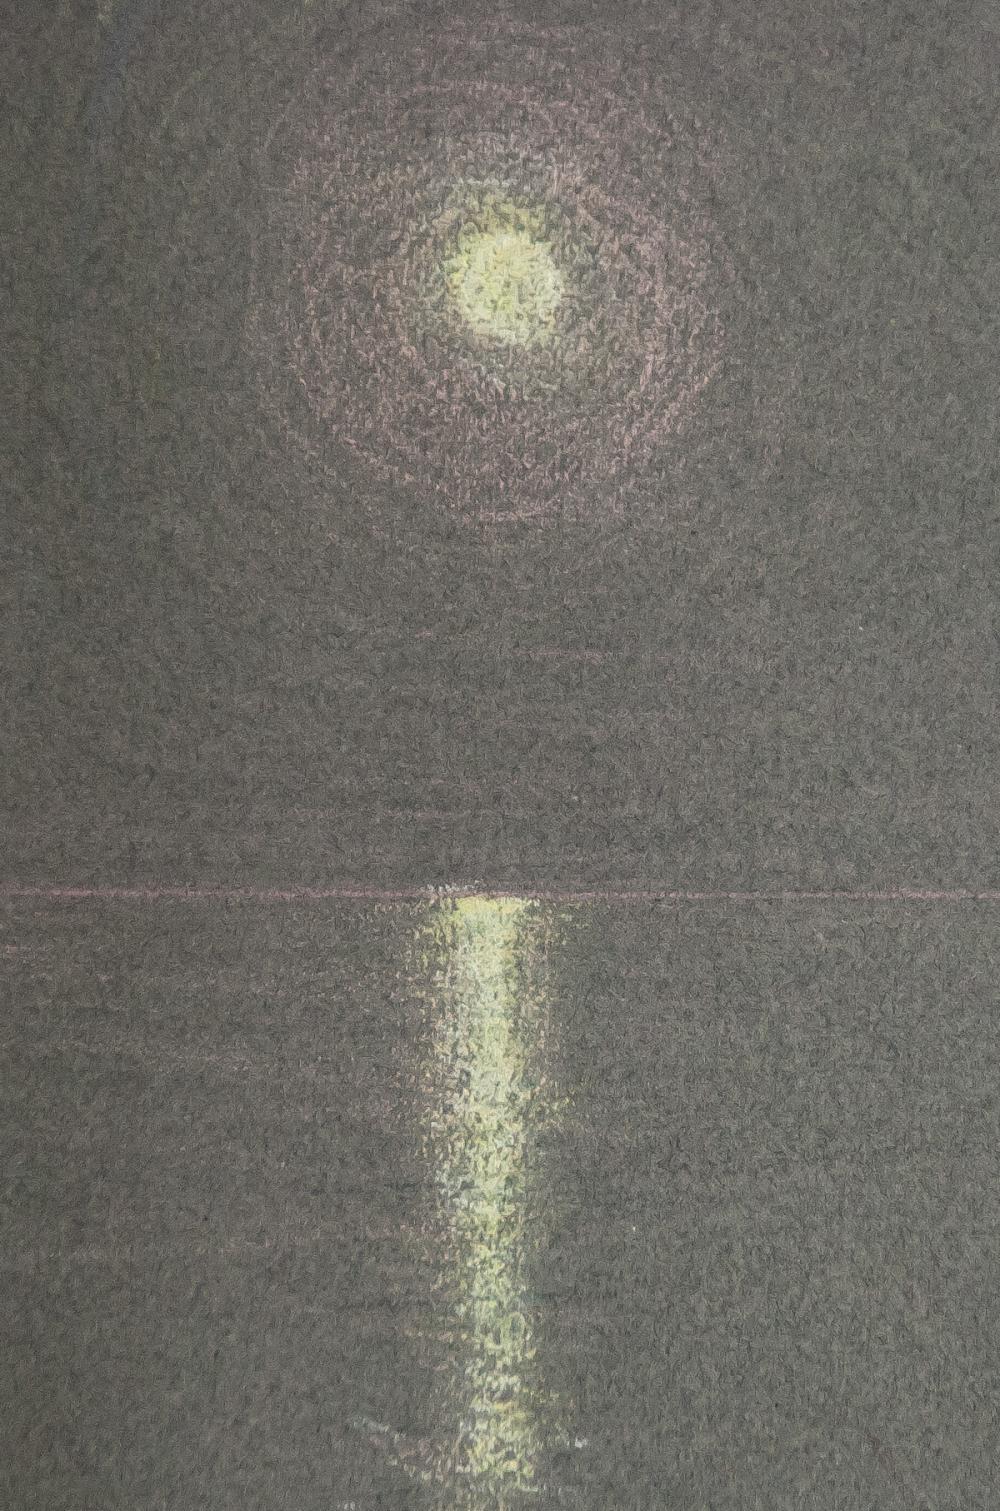 Lot 48: G. Gentile Italian Color Pencil on Paper Night